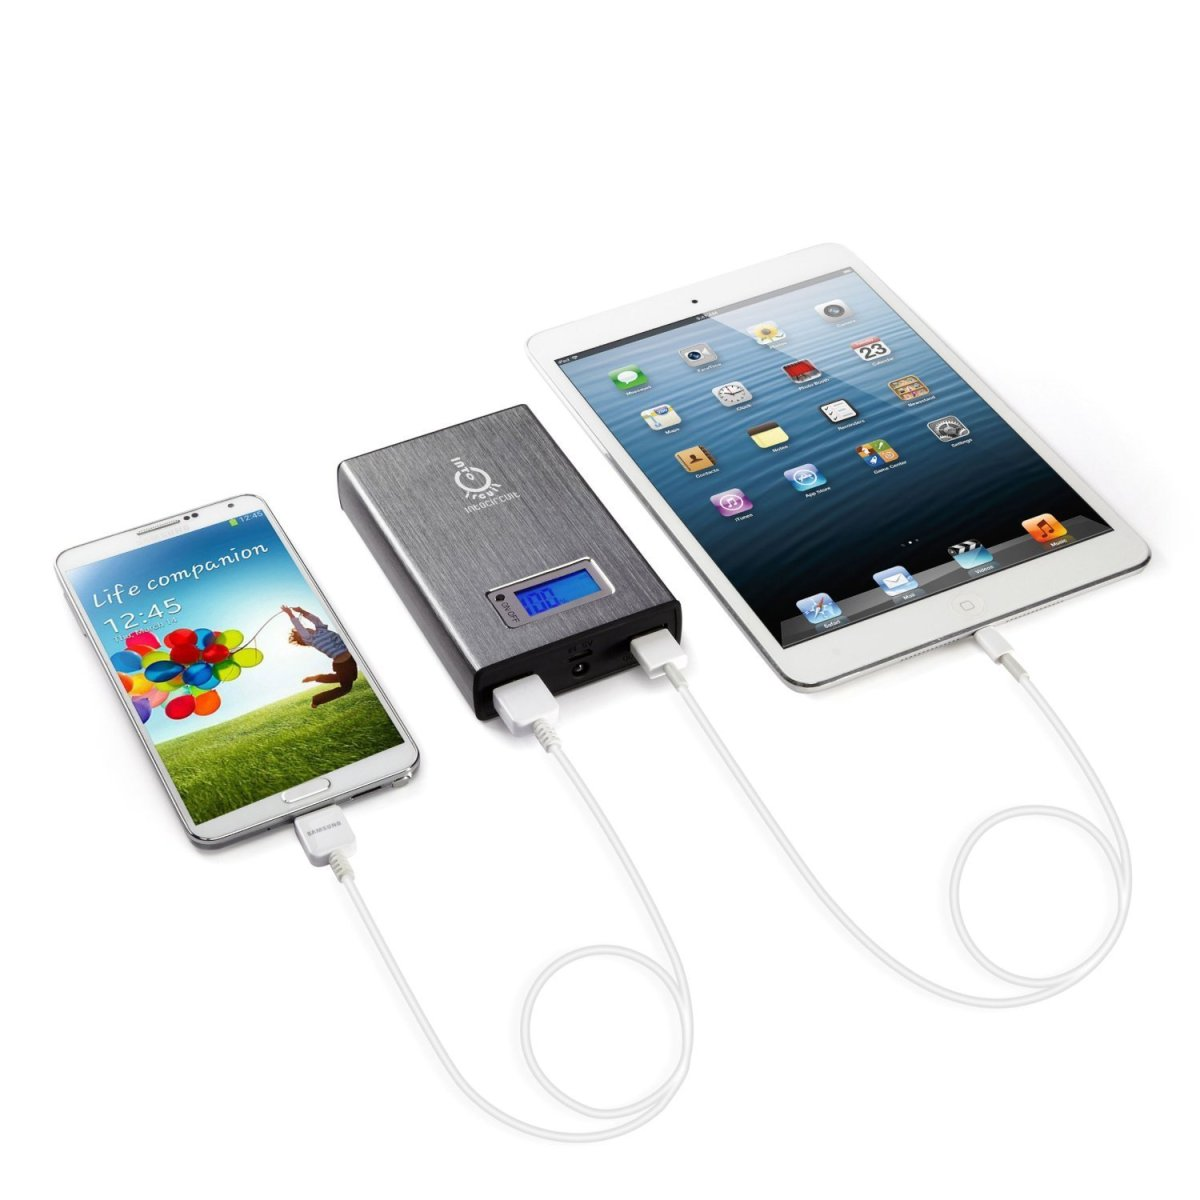 Comparativa 4 mejores baterías externas USB